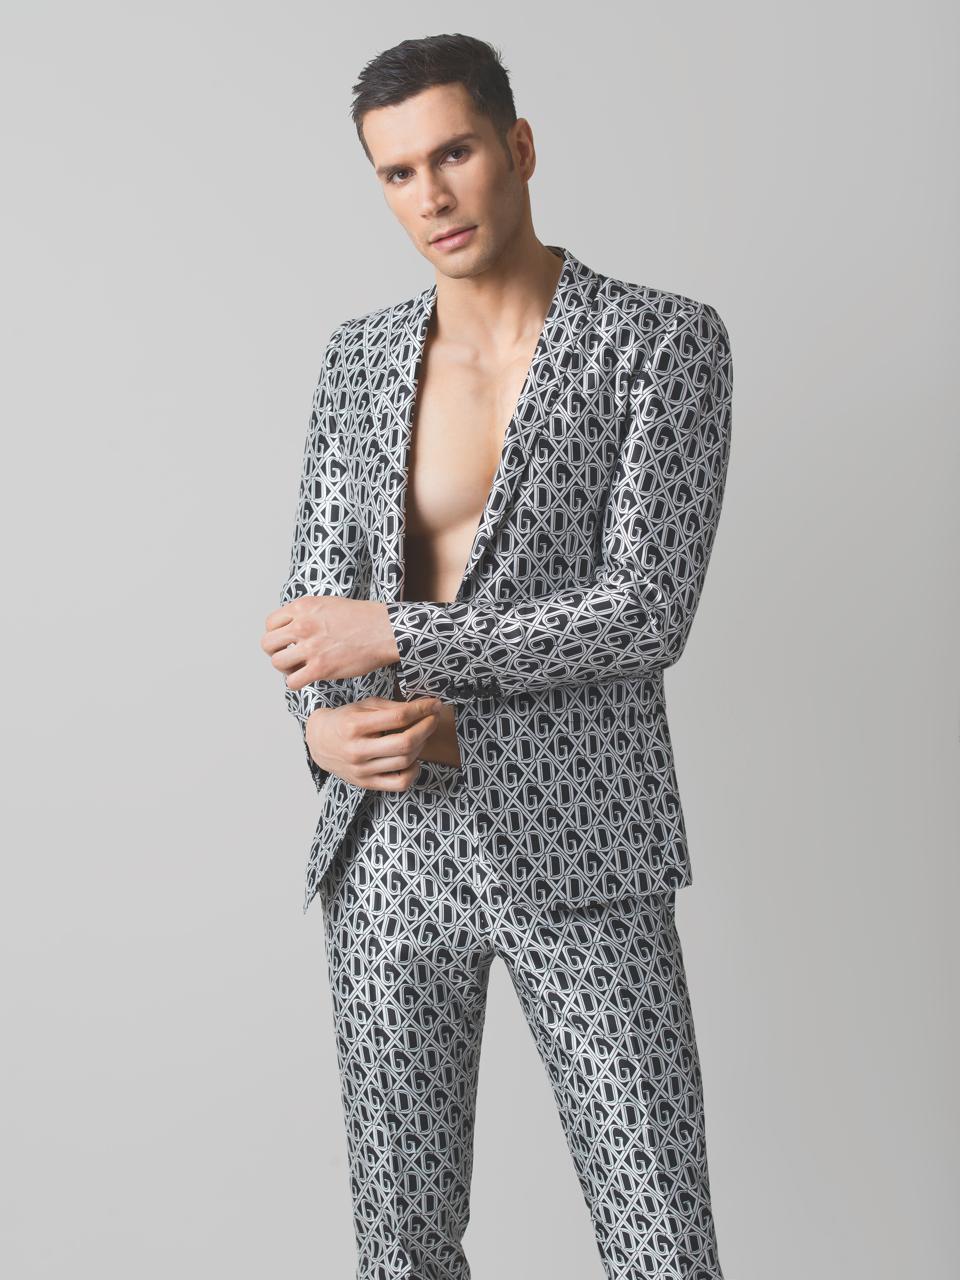 Celebrity Fitness: Dolce & Gabbana Spring/Summer season 2020 menswear series